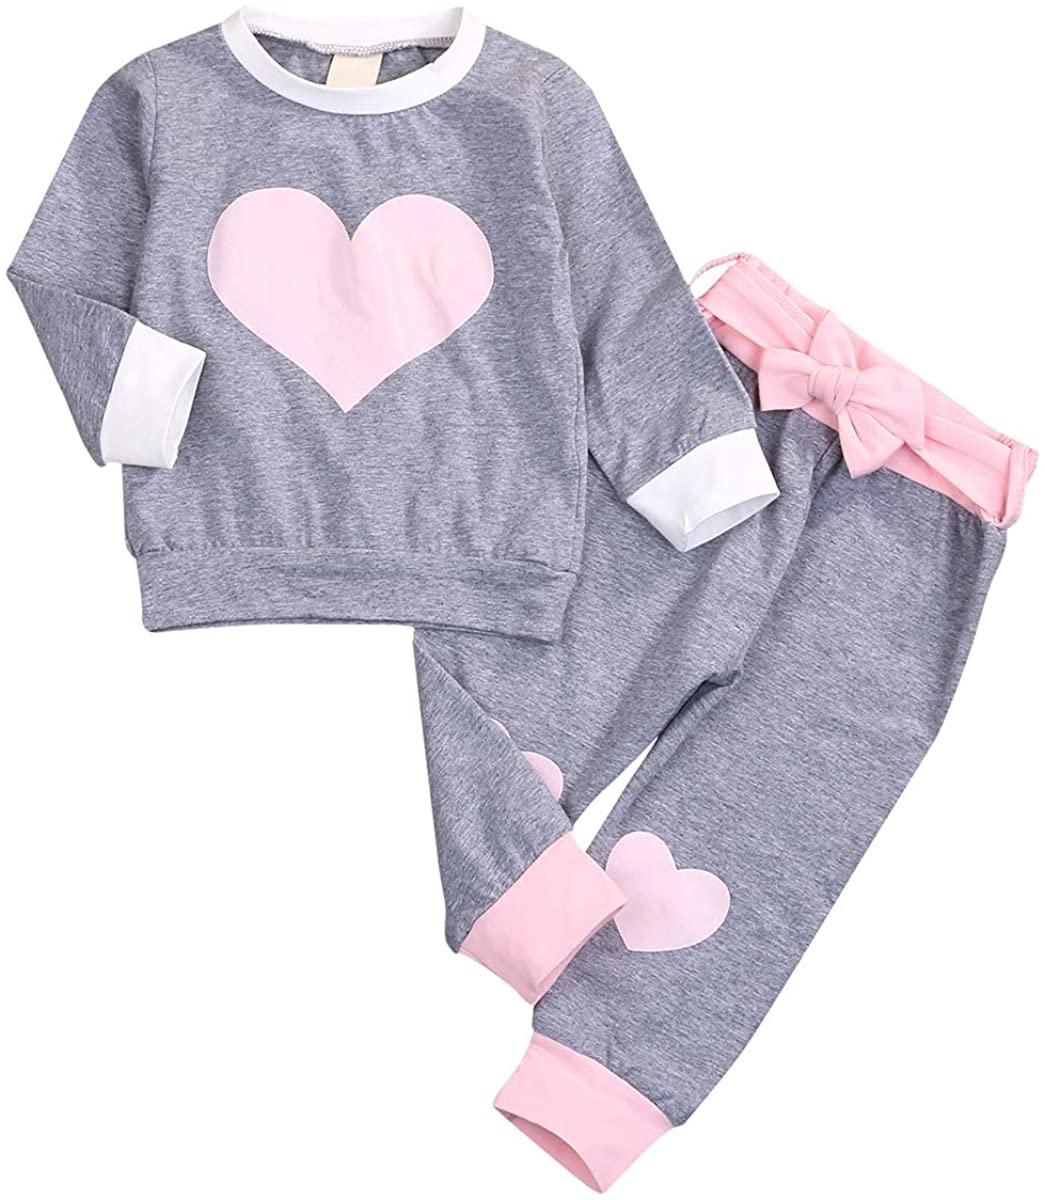 Newborn Baby Girl Clothes Heart Print Top + Pant + Belt Long Sleeve Outfit Sleepwear Set Sweatshirt